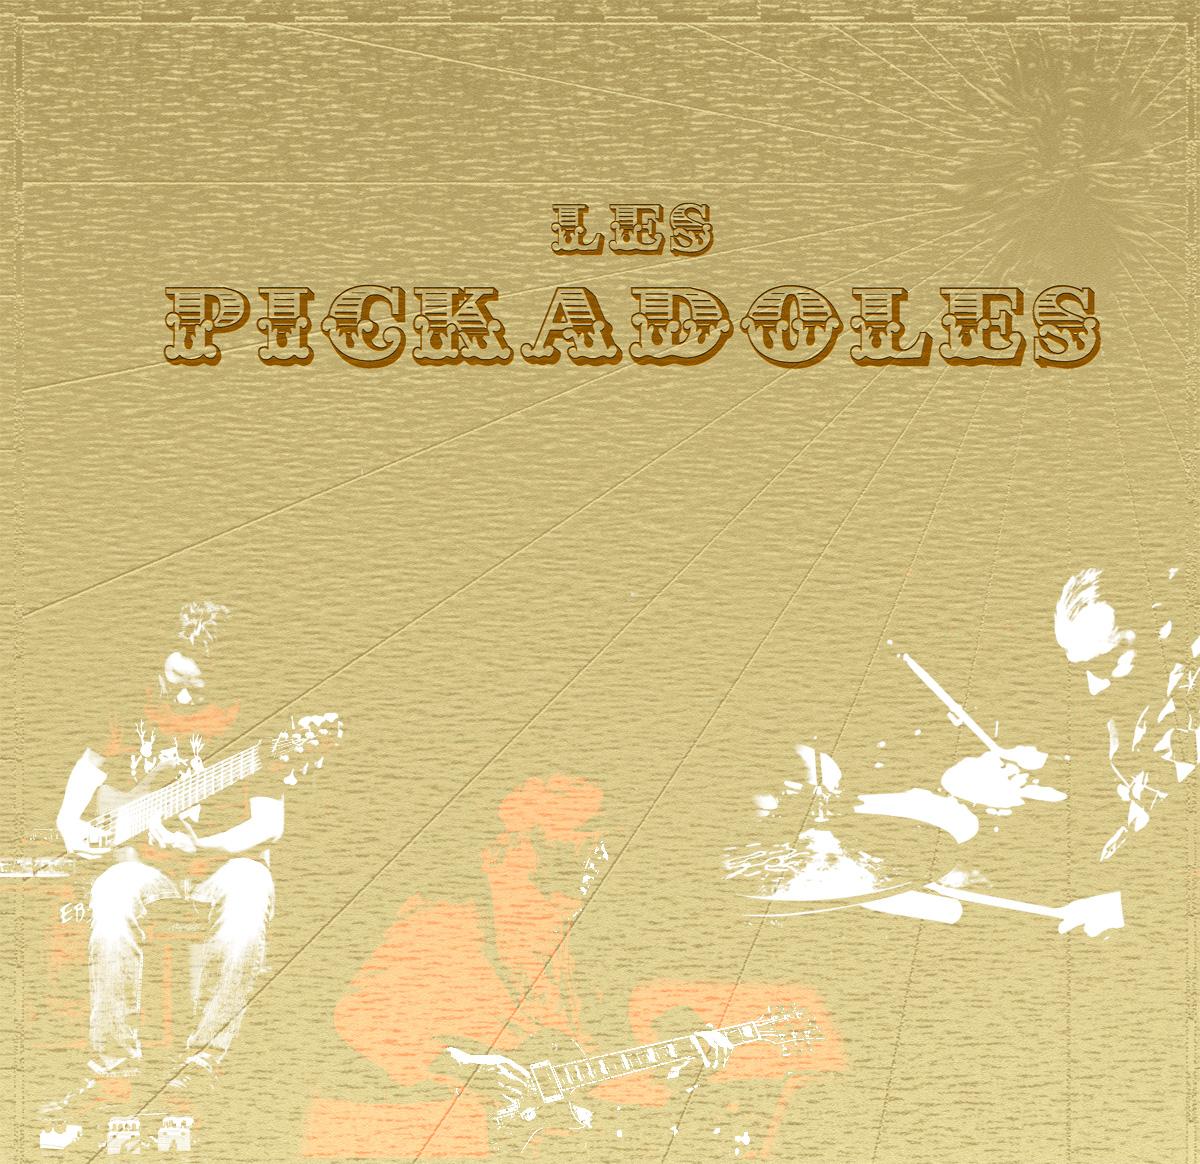 pickadoles-small